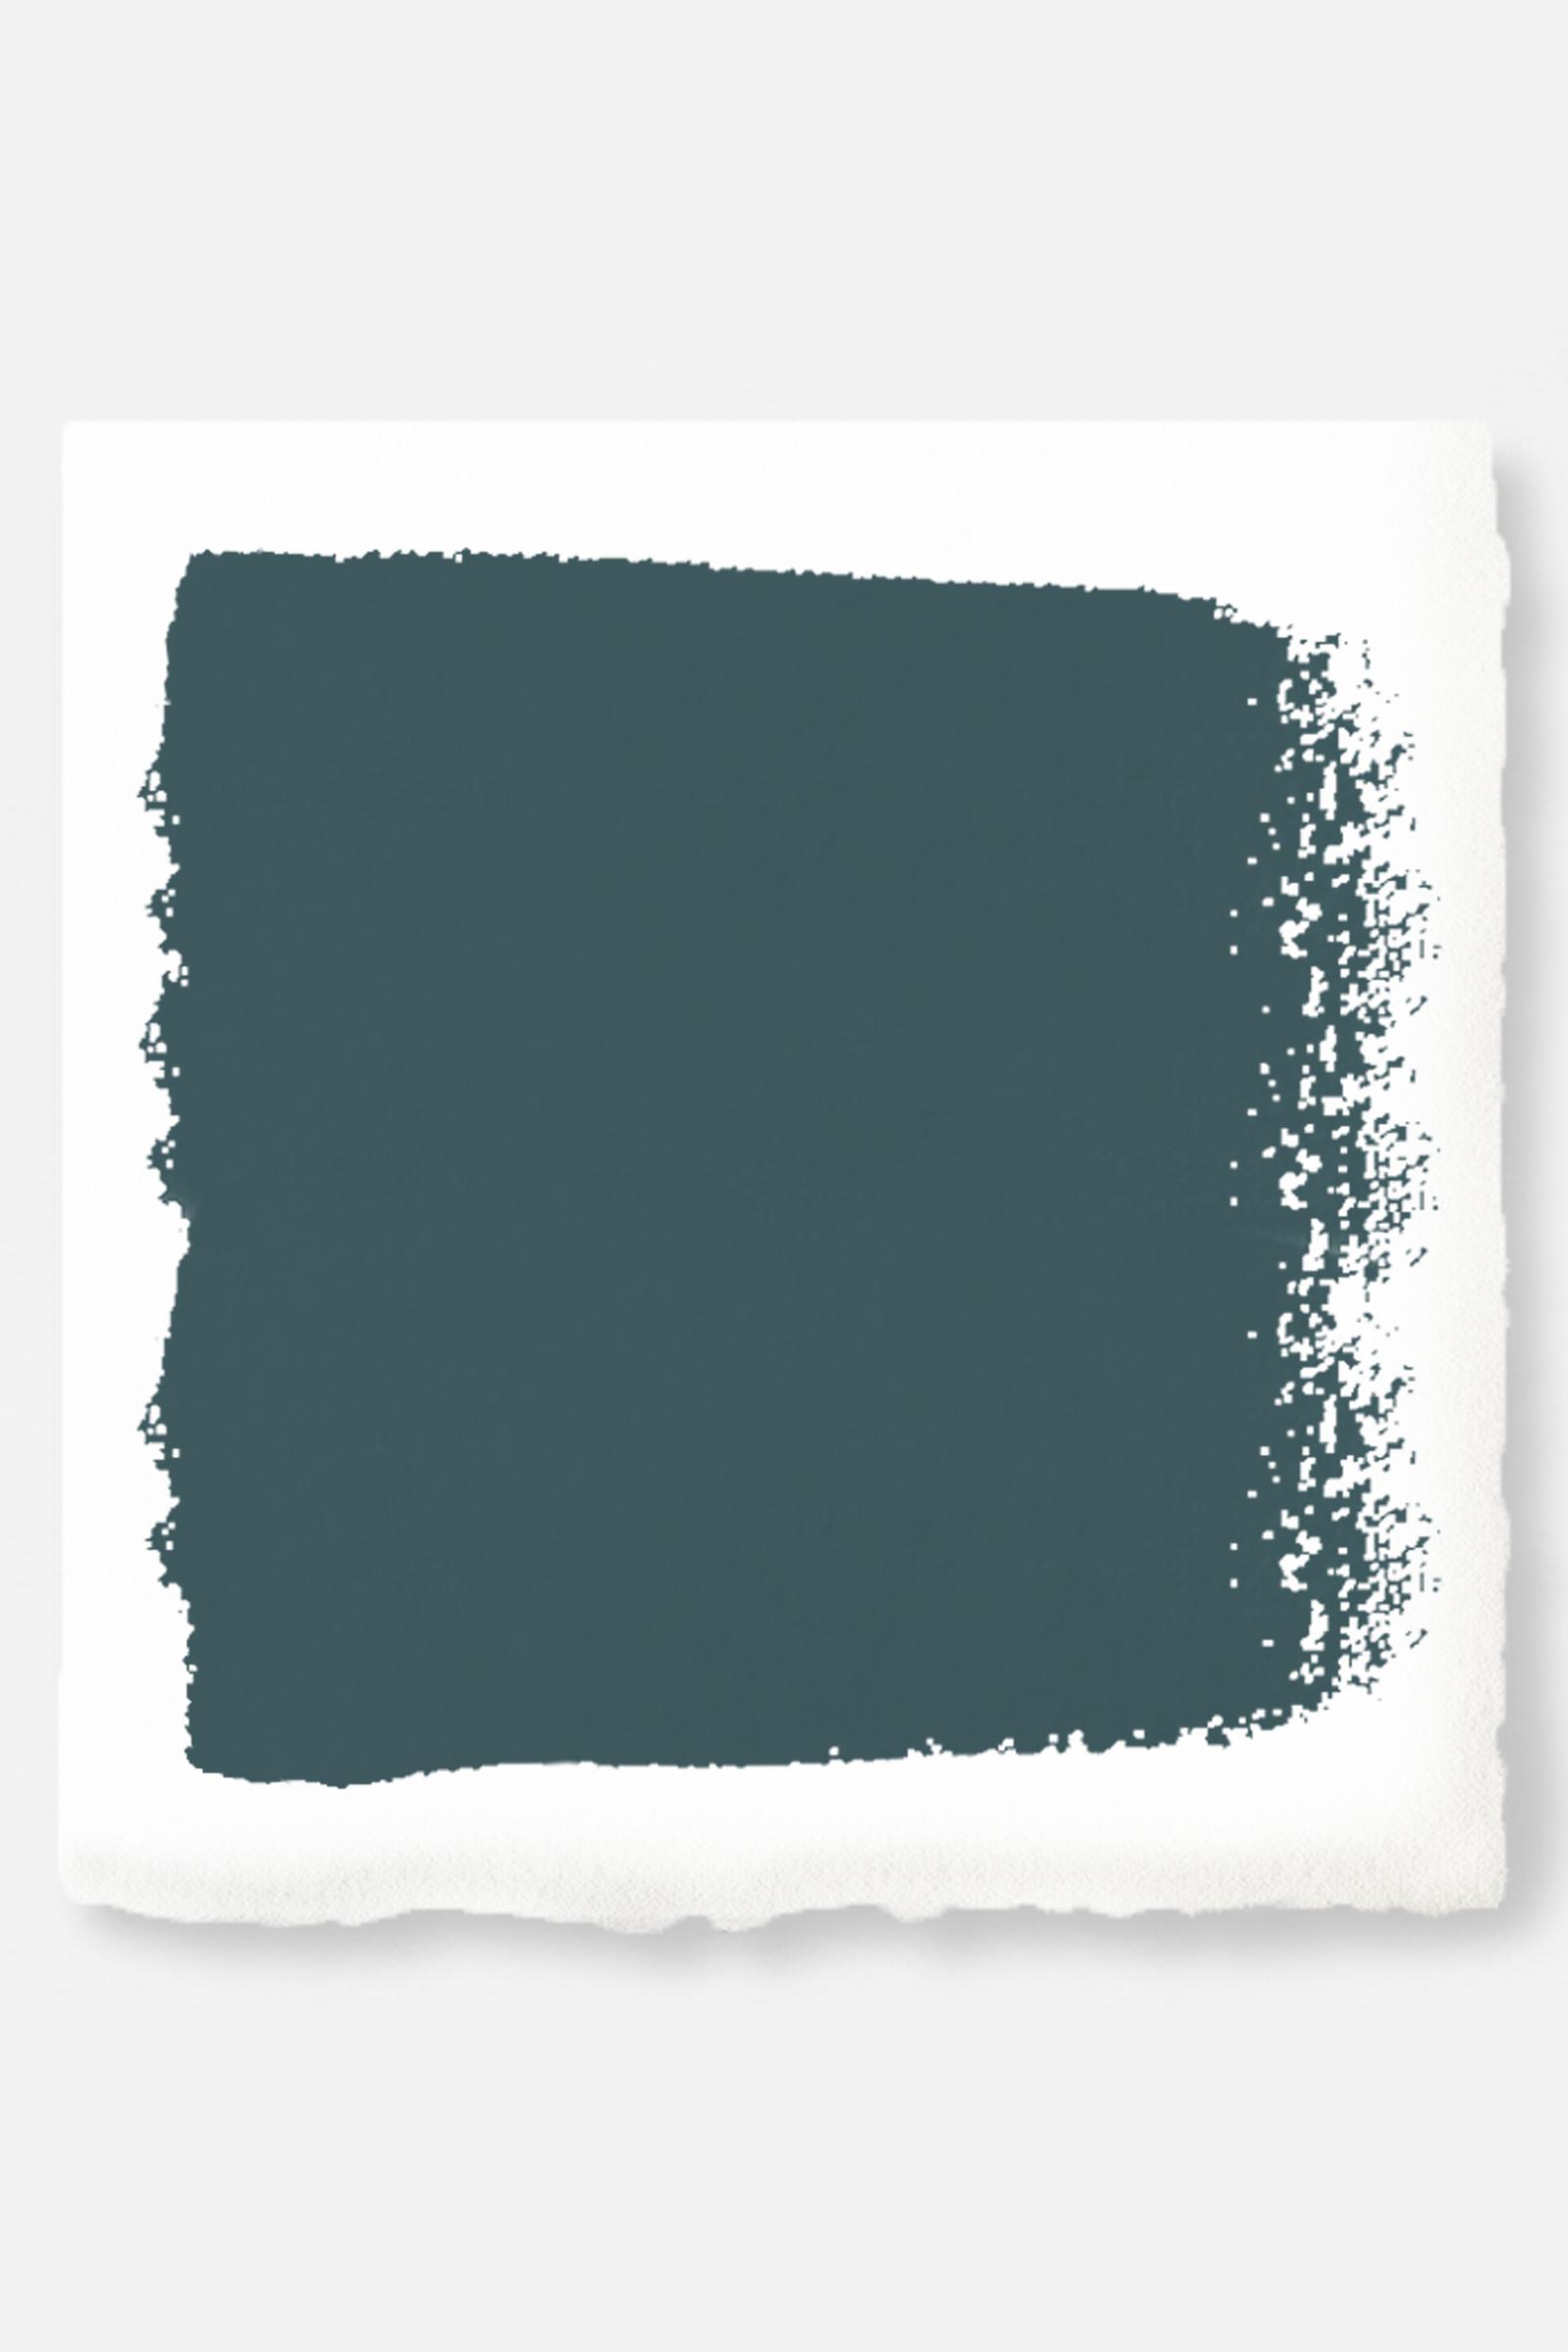 joanna gaines 39 favorite paint colors hgtv fixer upper paint colors. Black Bedroom Furniture Sets. Home Design Ideas